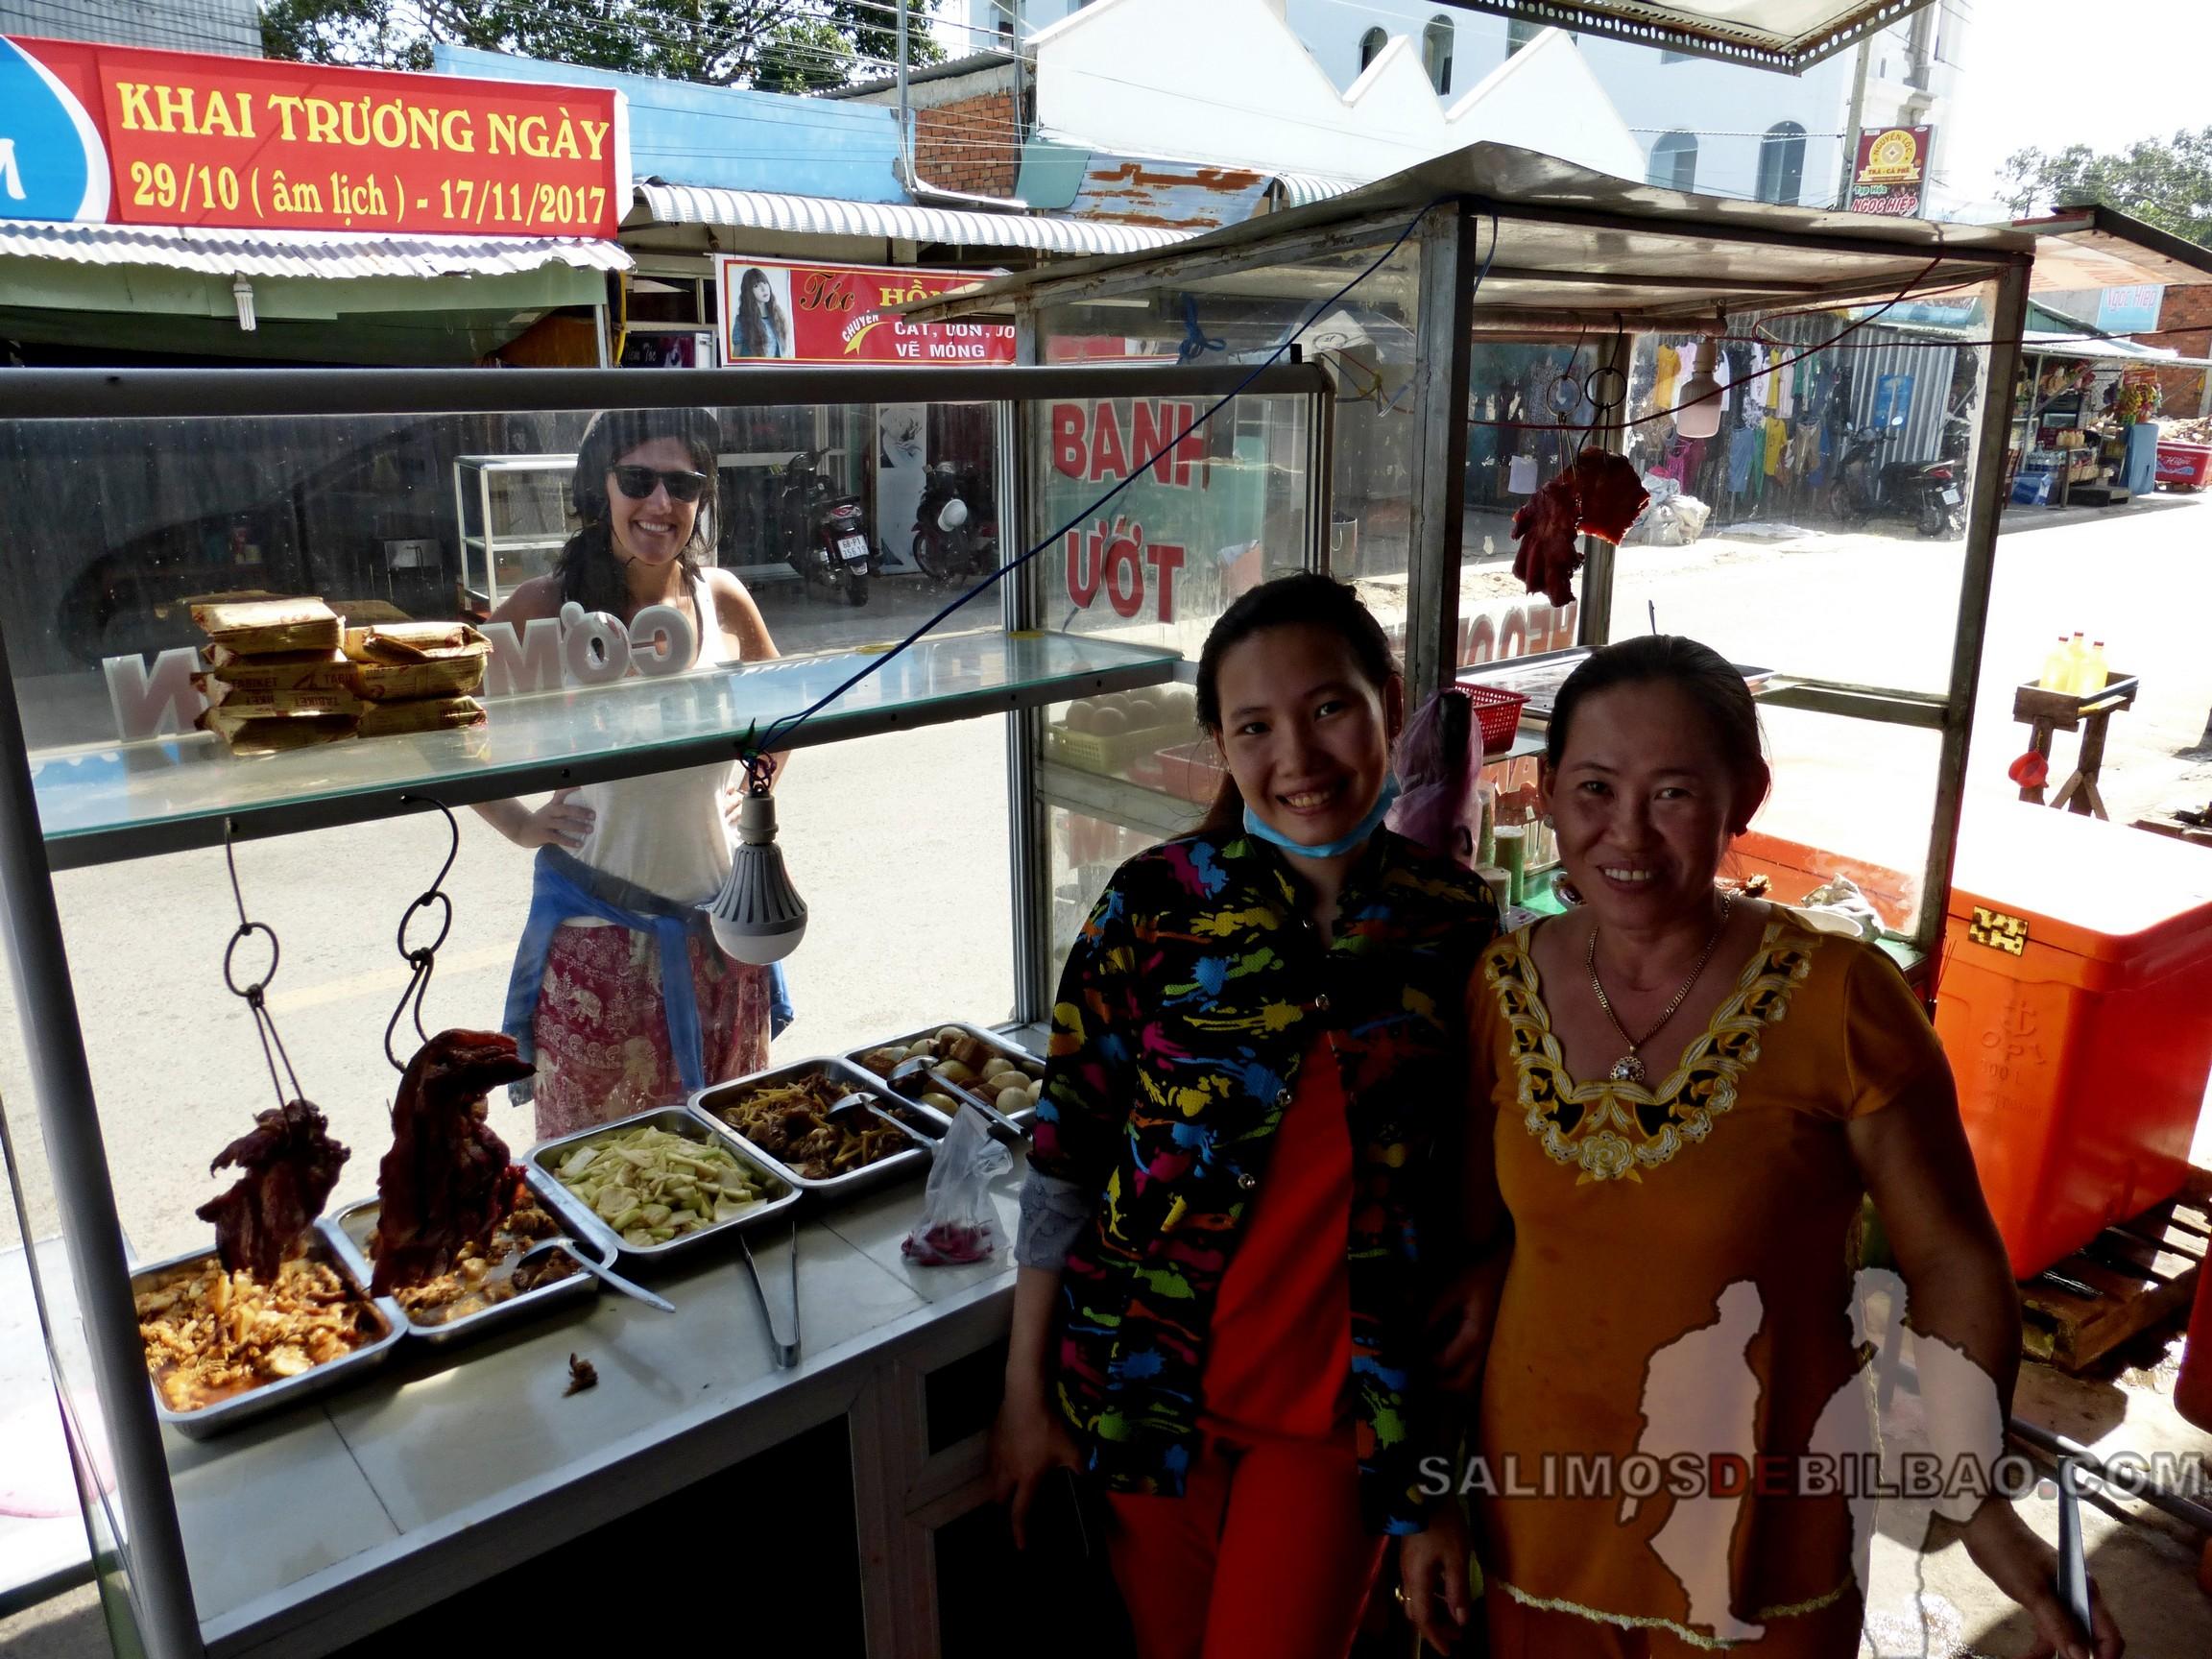 0154. Saioa, Puesto de comida, Noreste de Phu Quoc